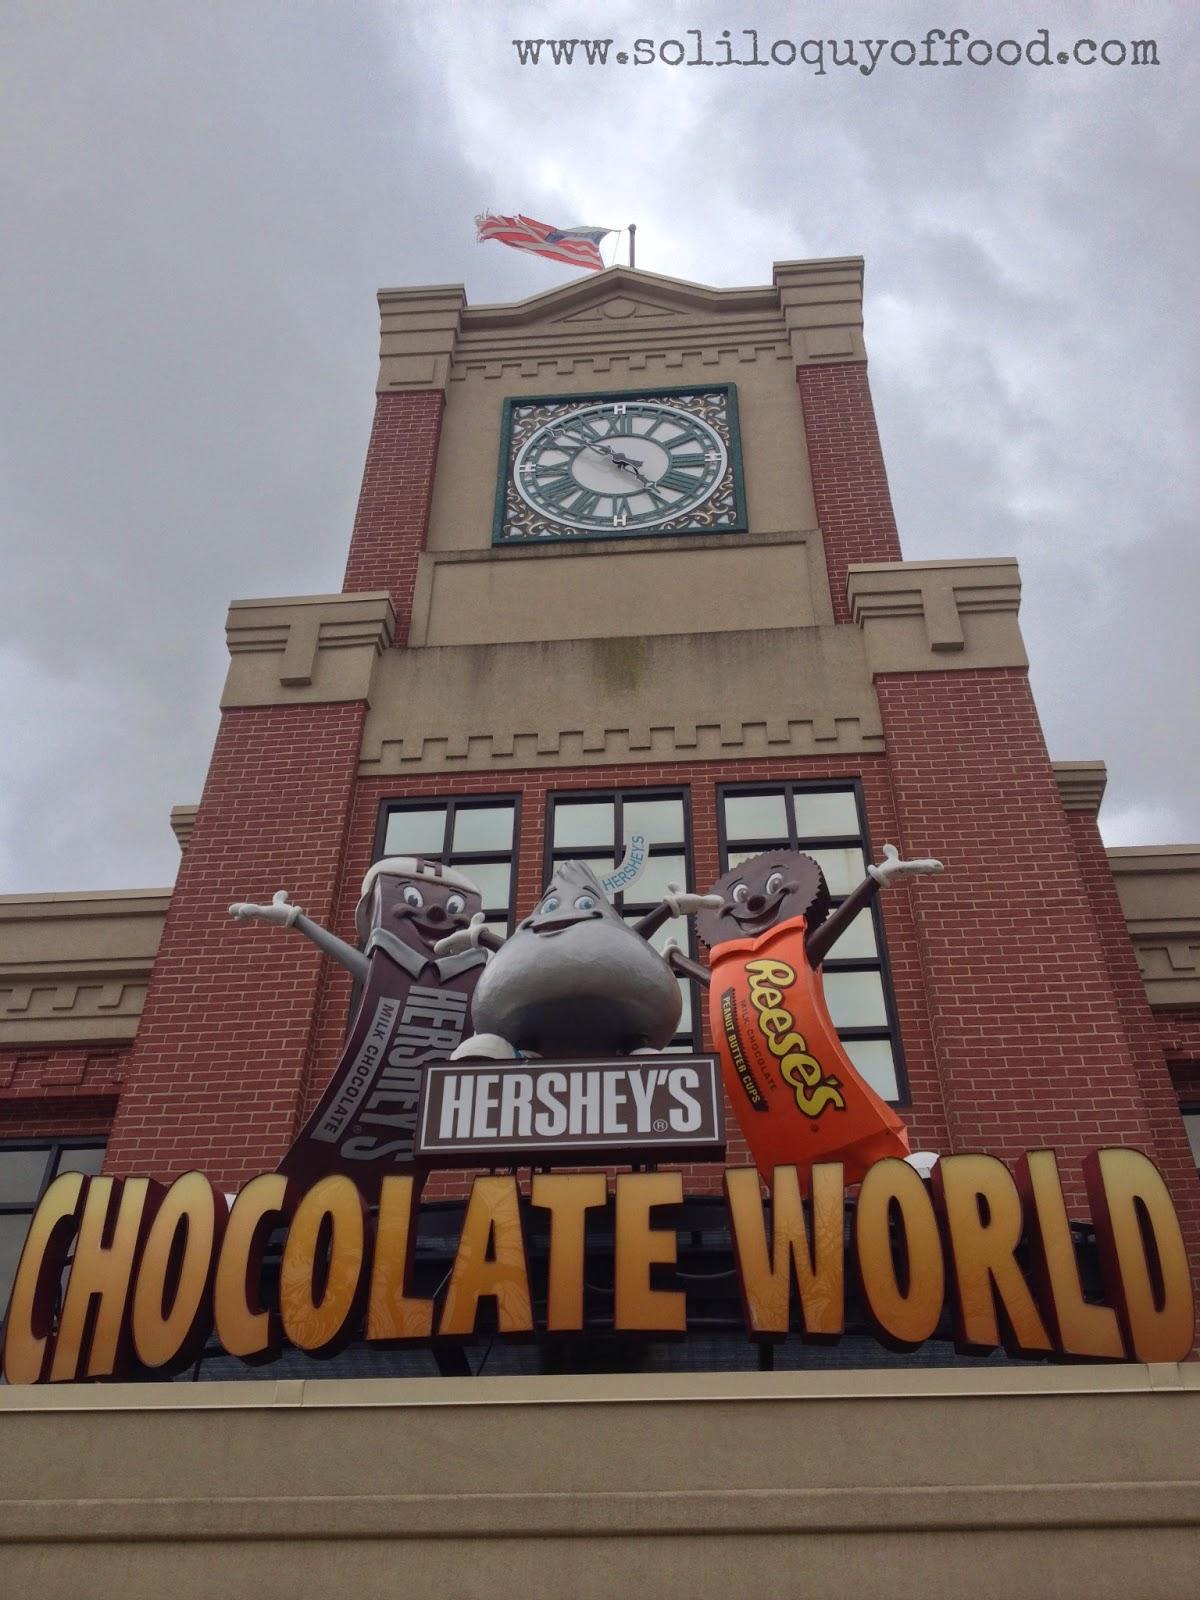 Chocolate World, Hershey, PA USA - www.soliloquyoffood.com